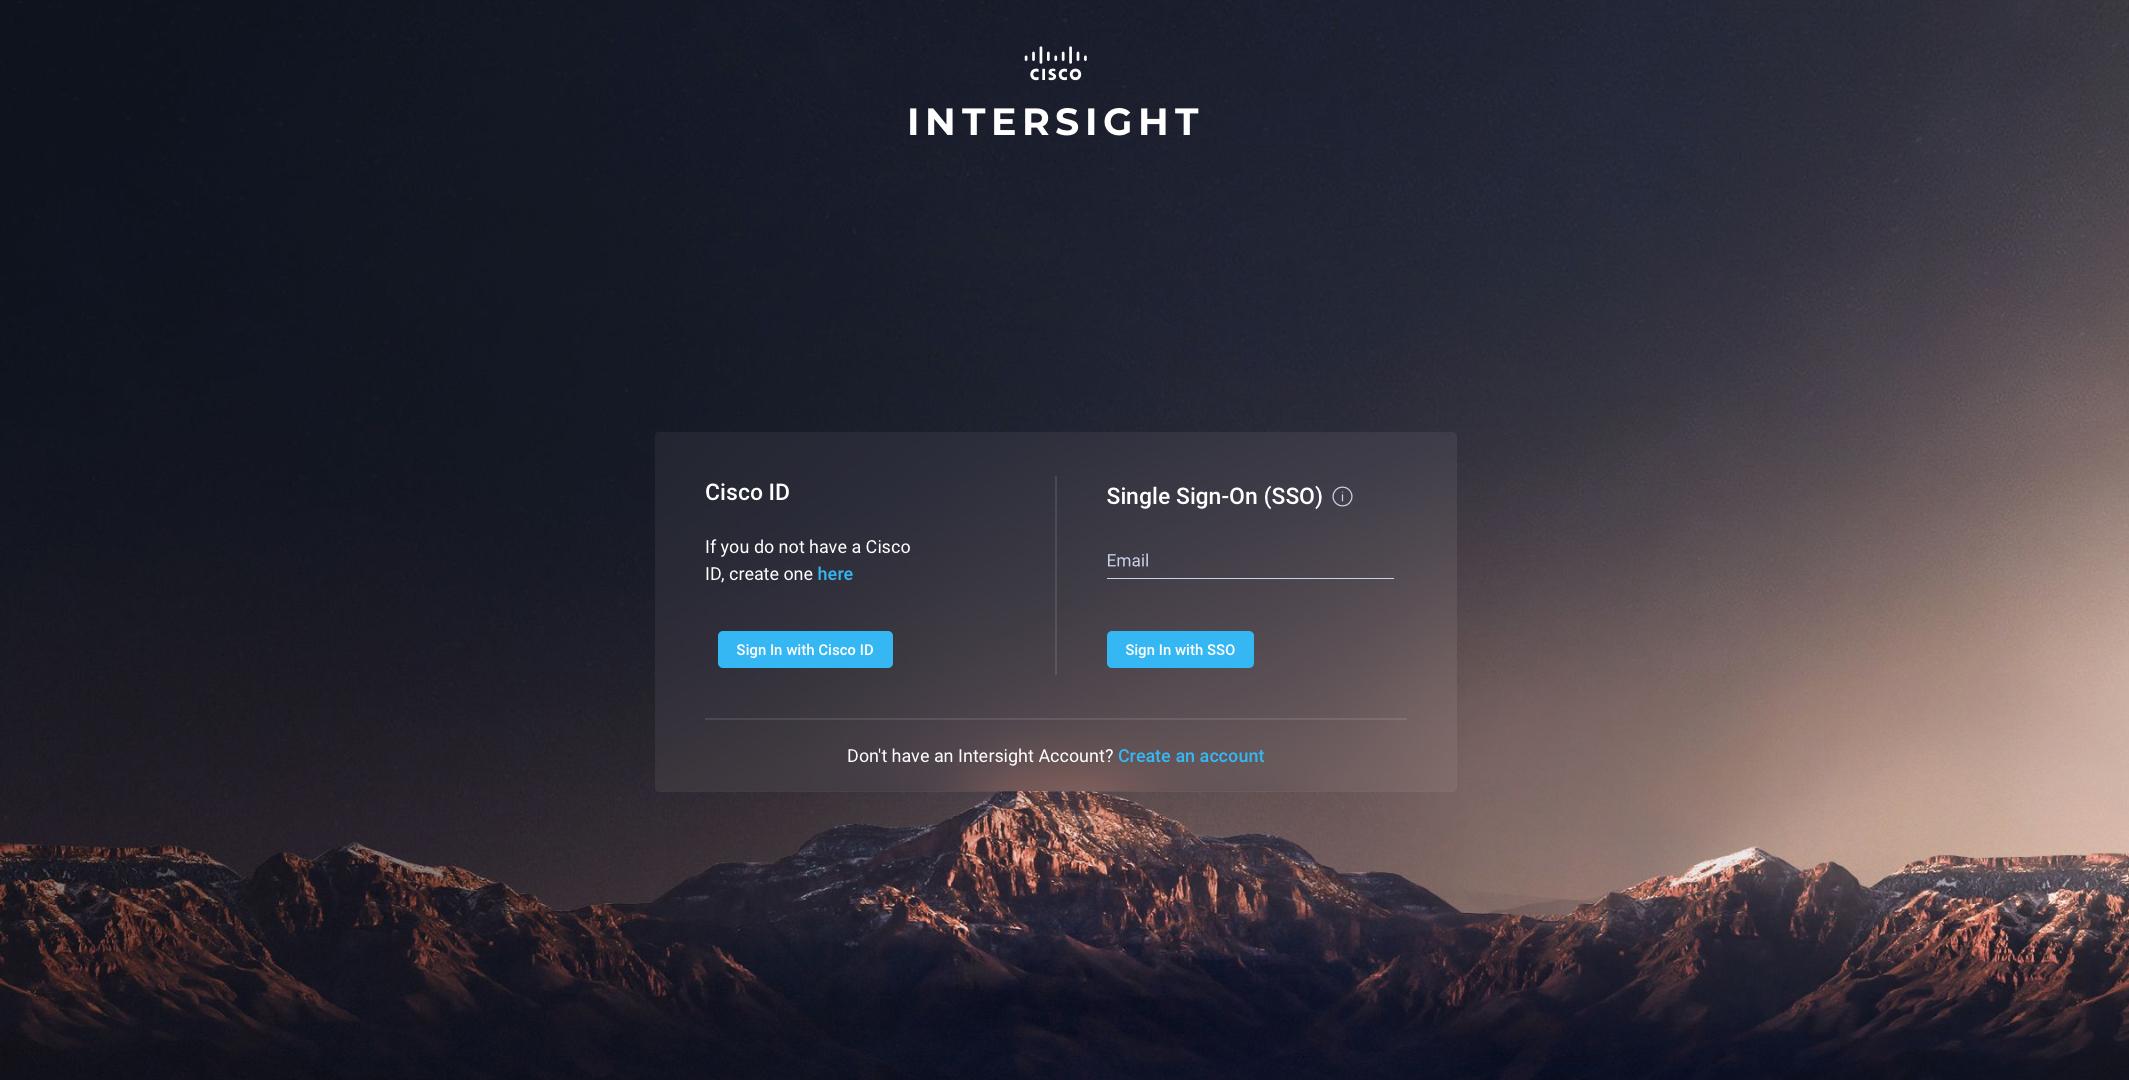 Cisco Intersight log-on page